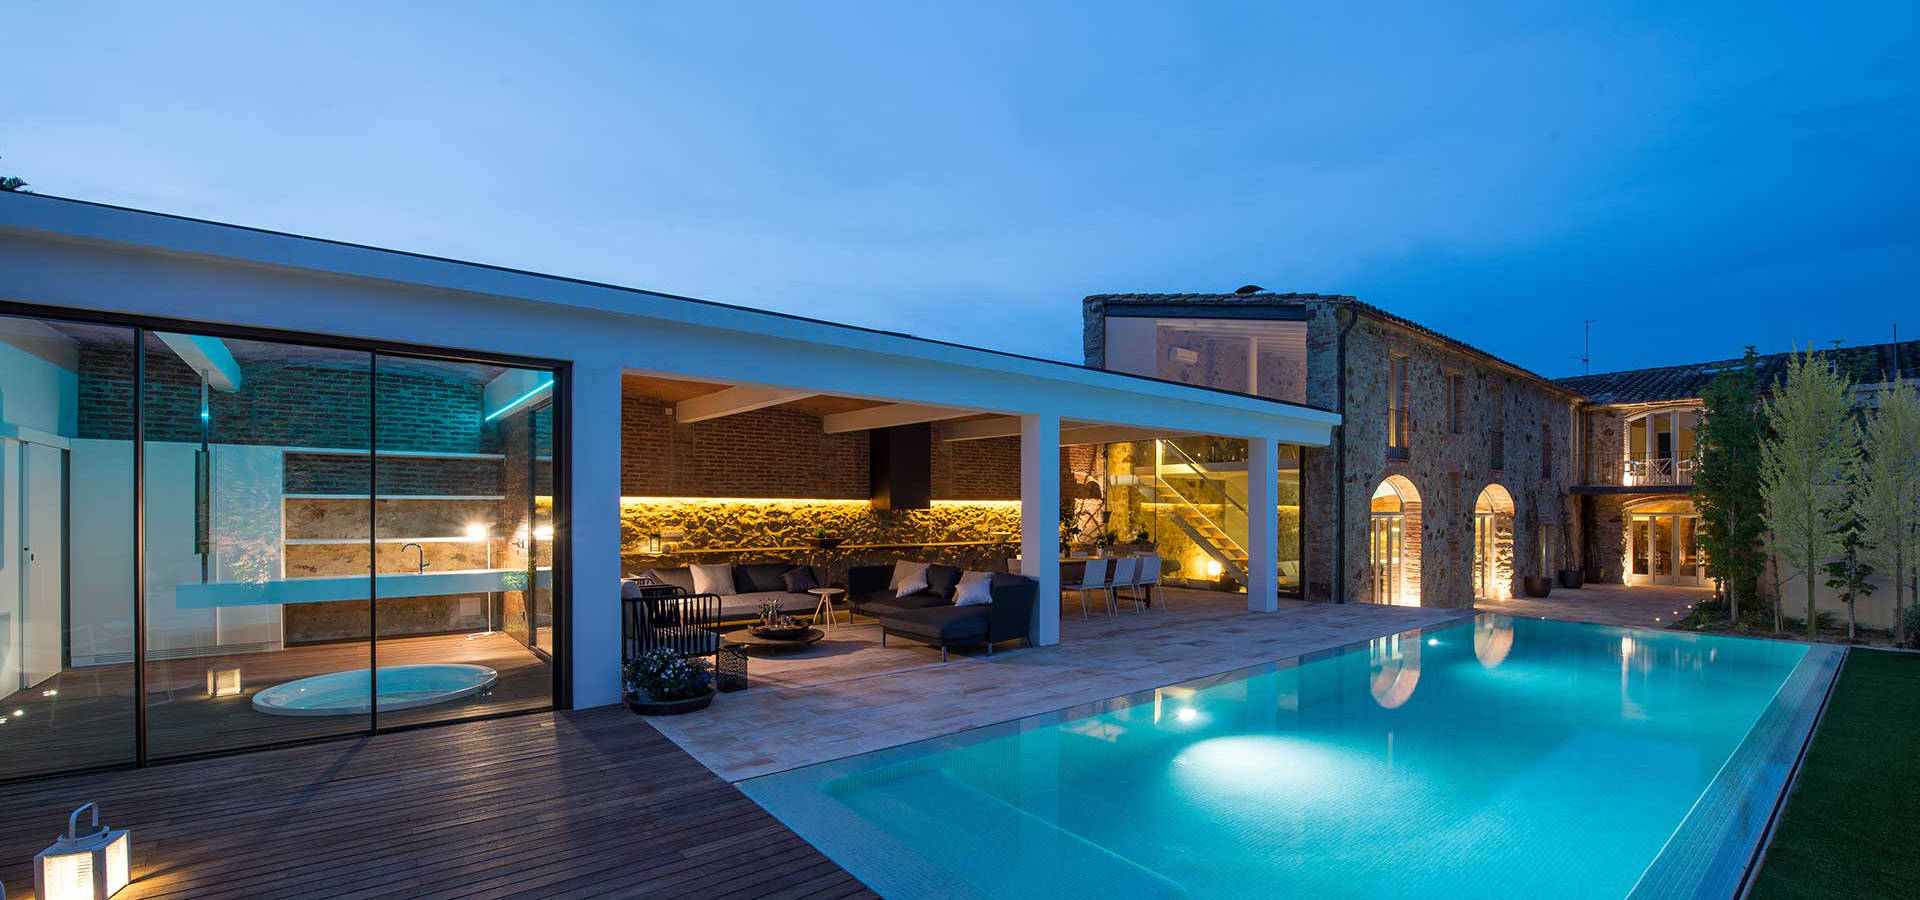 Gloria-Duran-Arquitecte-Habitatge-Carrer-Samaria-34